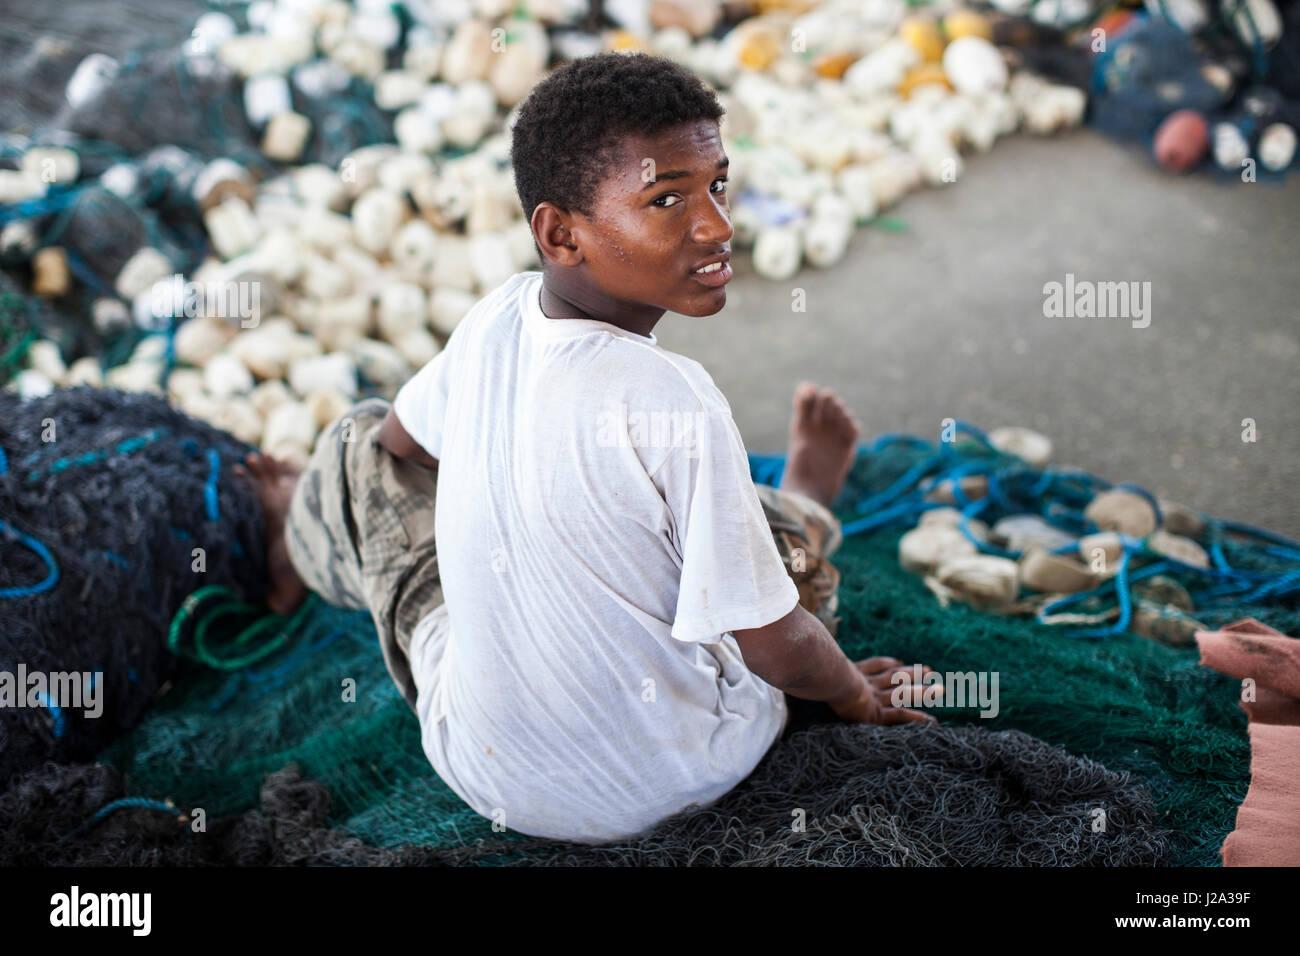 bandar abbas city a Fisher man. IRAN - Stock Image